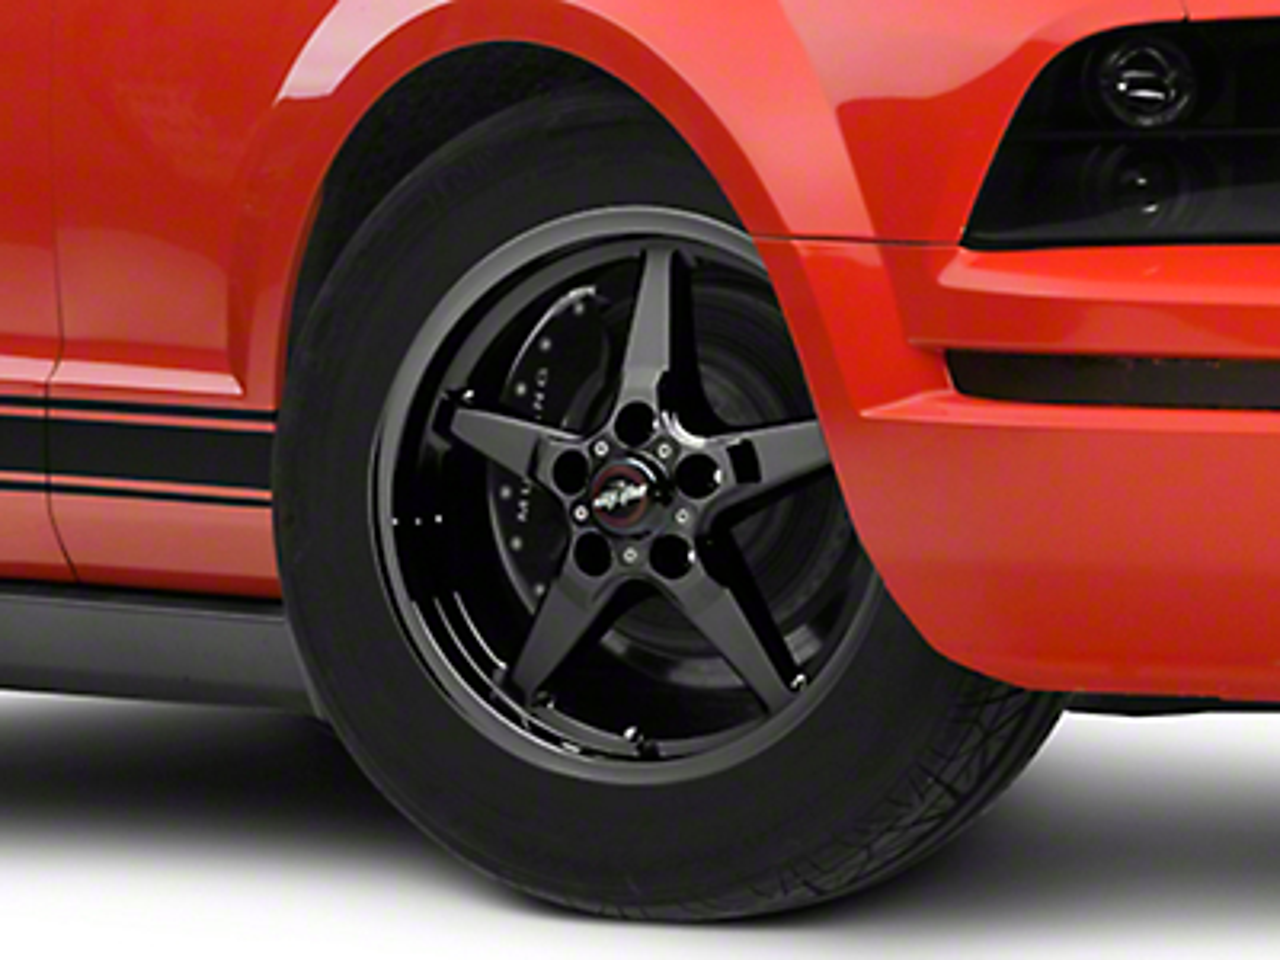 Race Star Dark Star Drag Wheel - Direct Drill - 17x4.5 (05-14 All, Excludes 13-14 GT500)